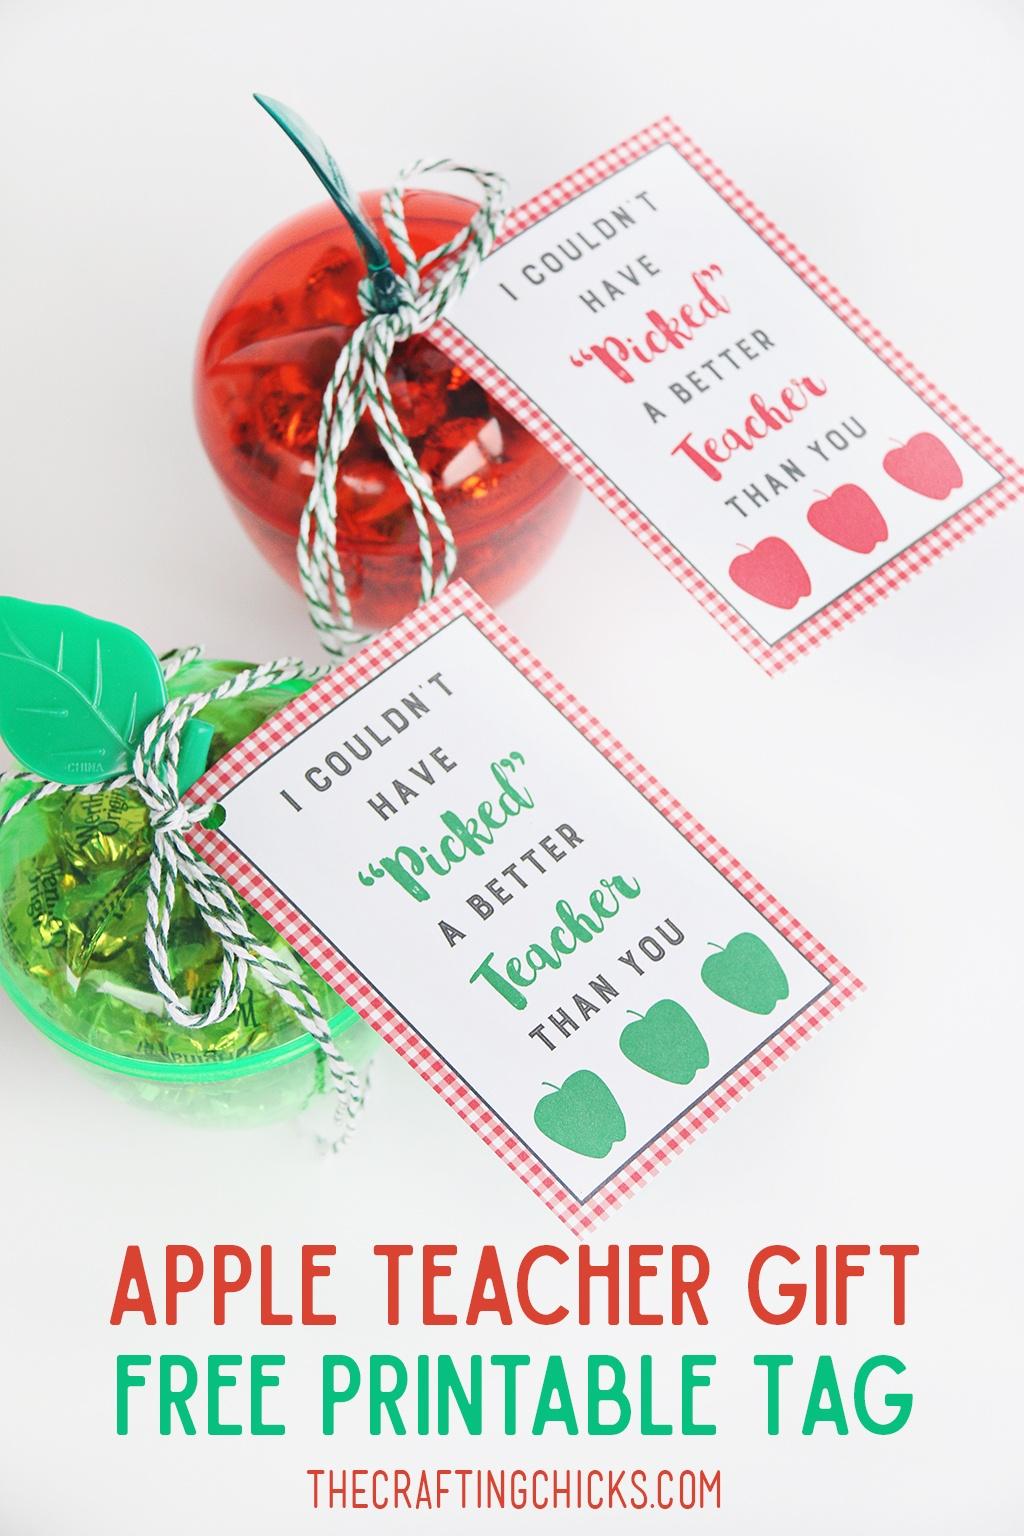 Apple Teacher Gift Tag Printable - The Crafting Chicks - Teacher Gift Tags Printable Free